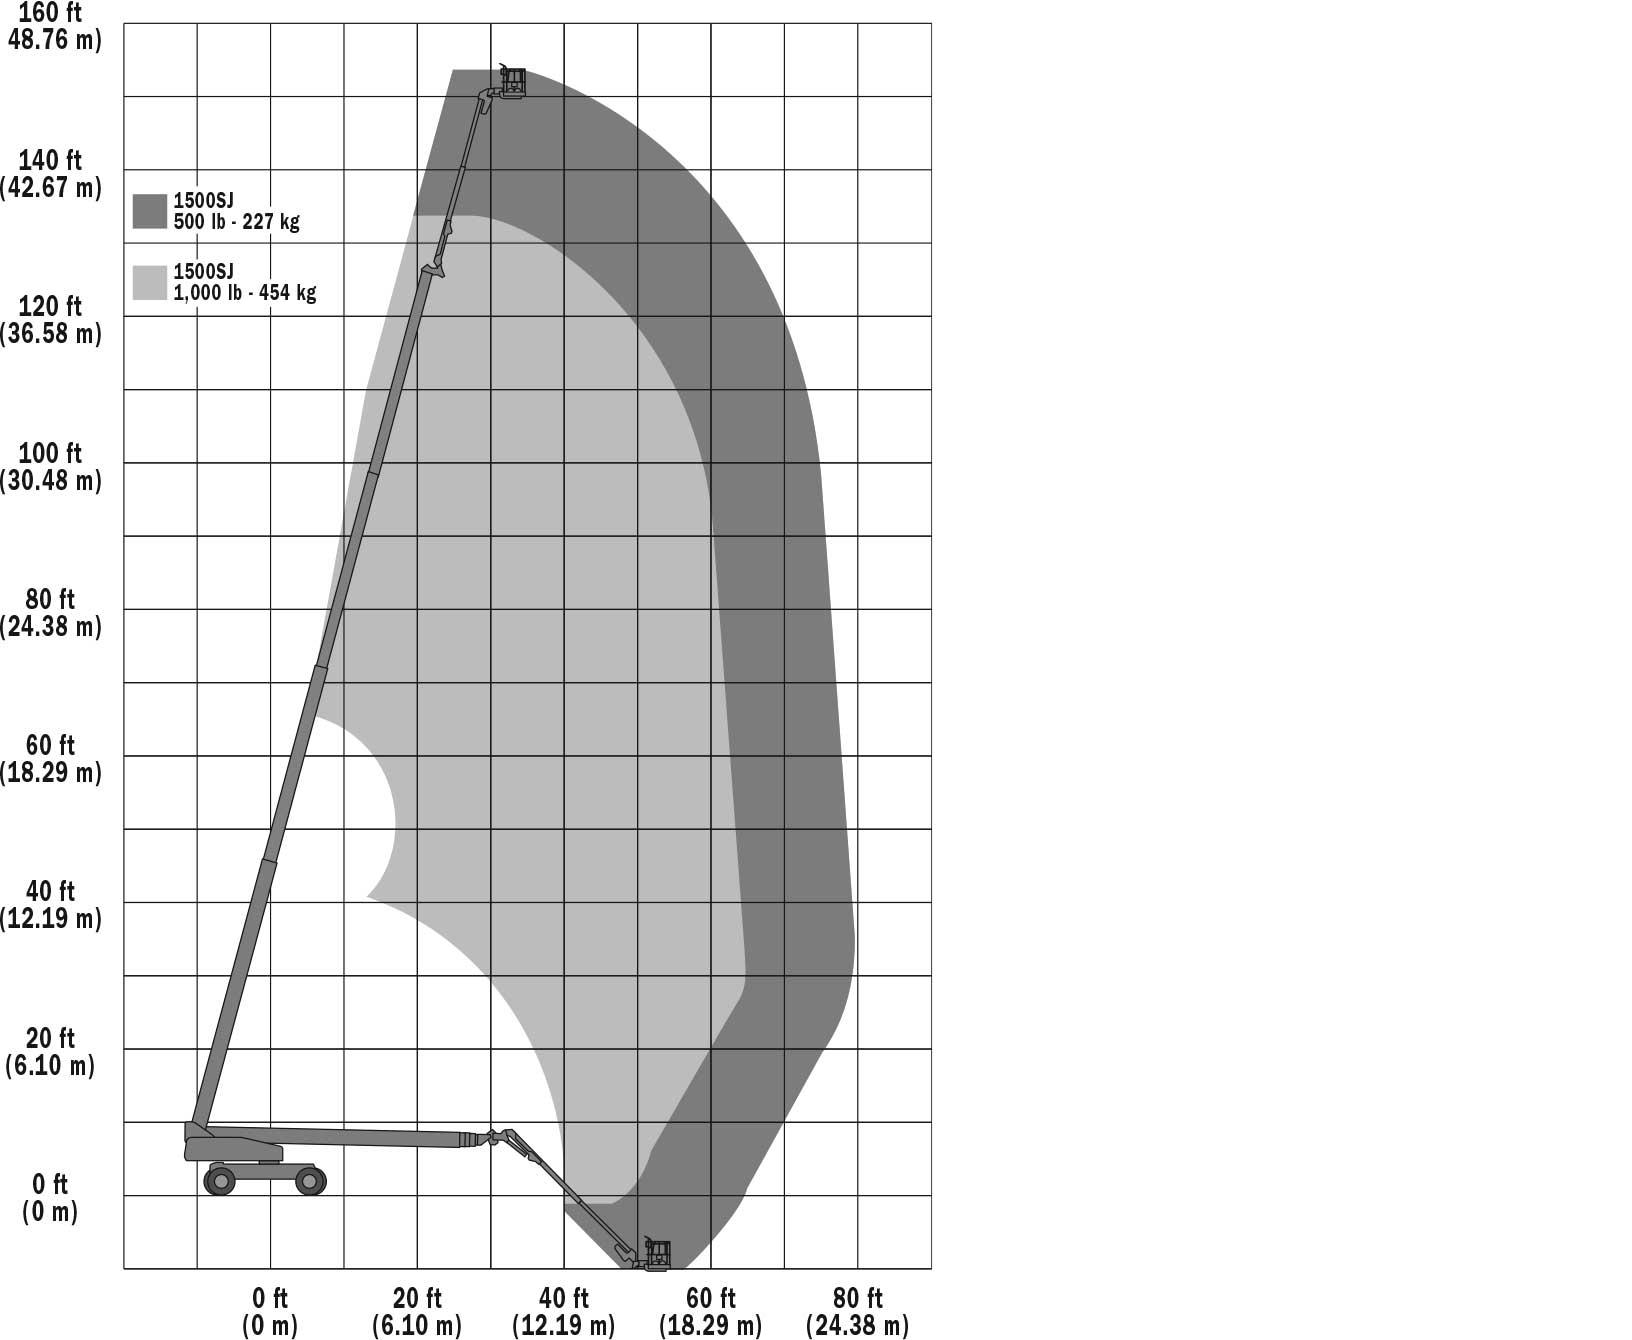 JLG 1500SJ Reach Diagram